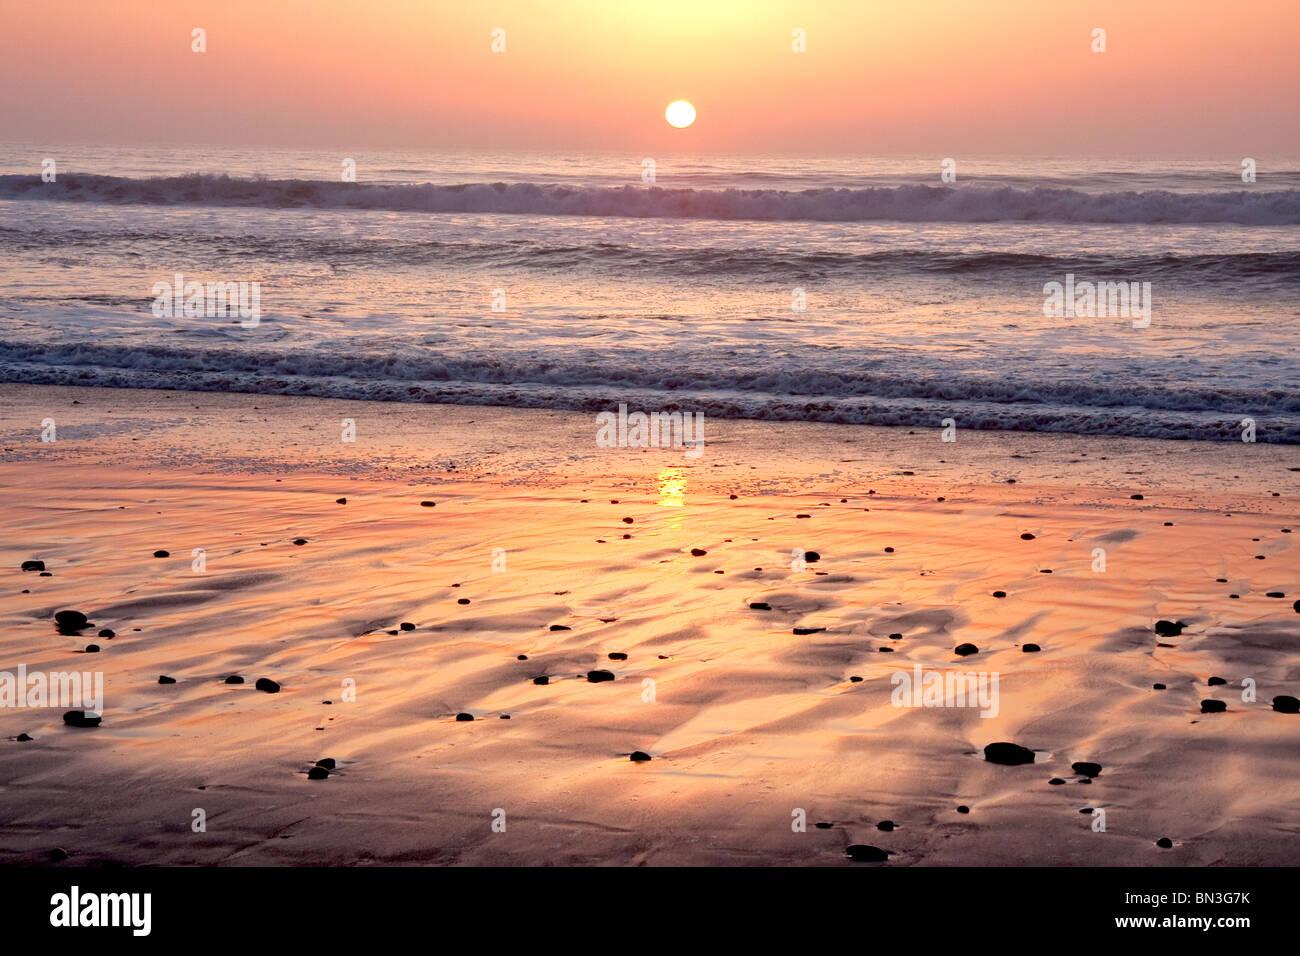 La Jolla's Torrey Pines beach at sunset, California - Stock Image